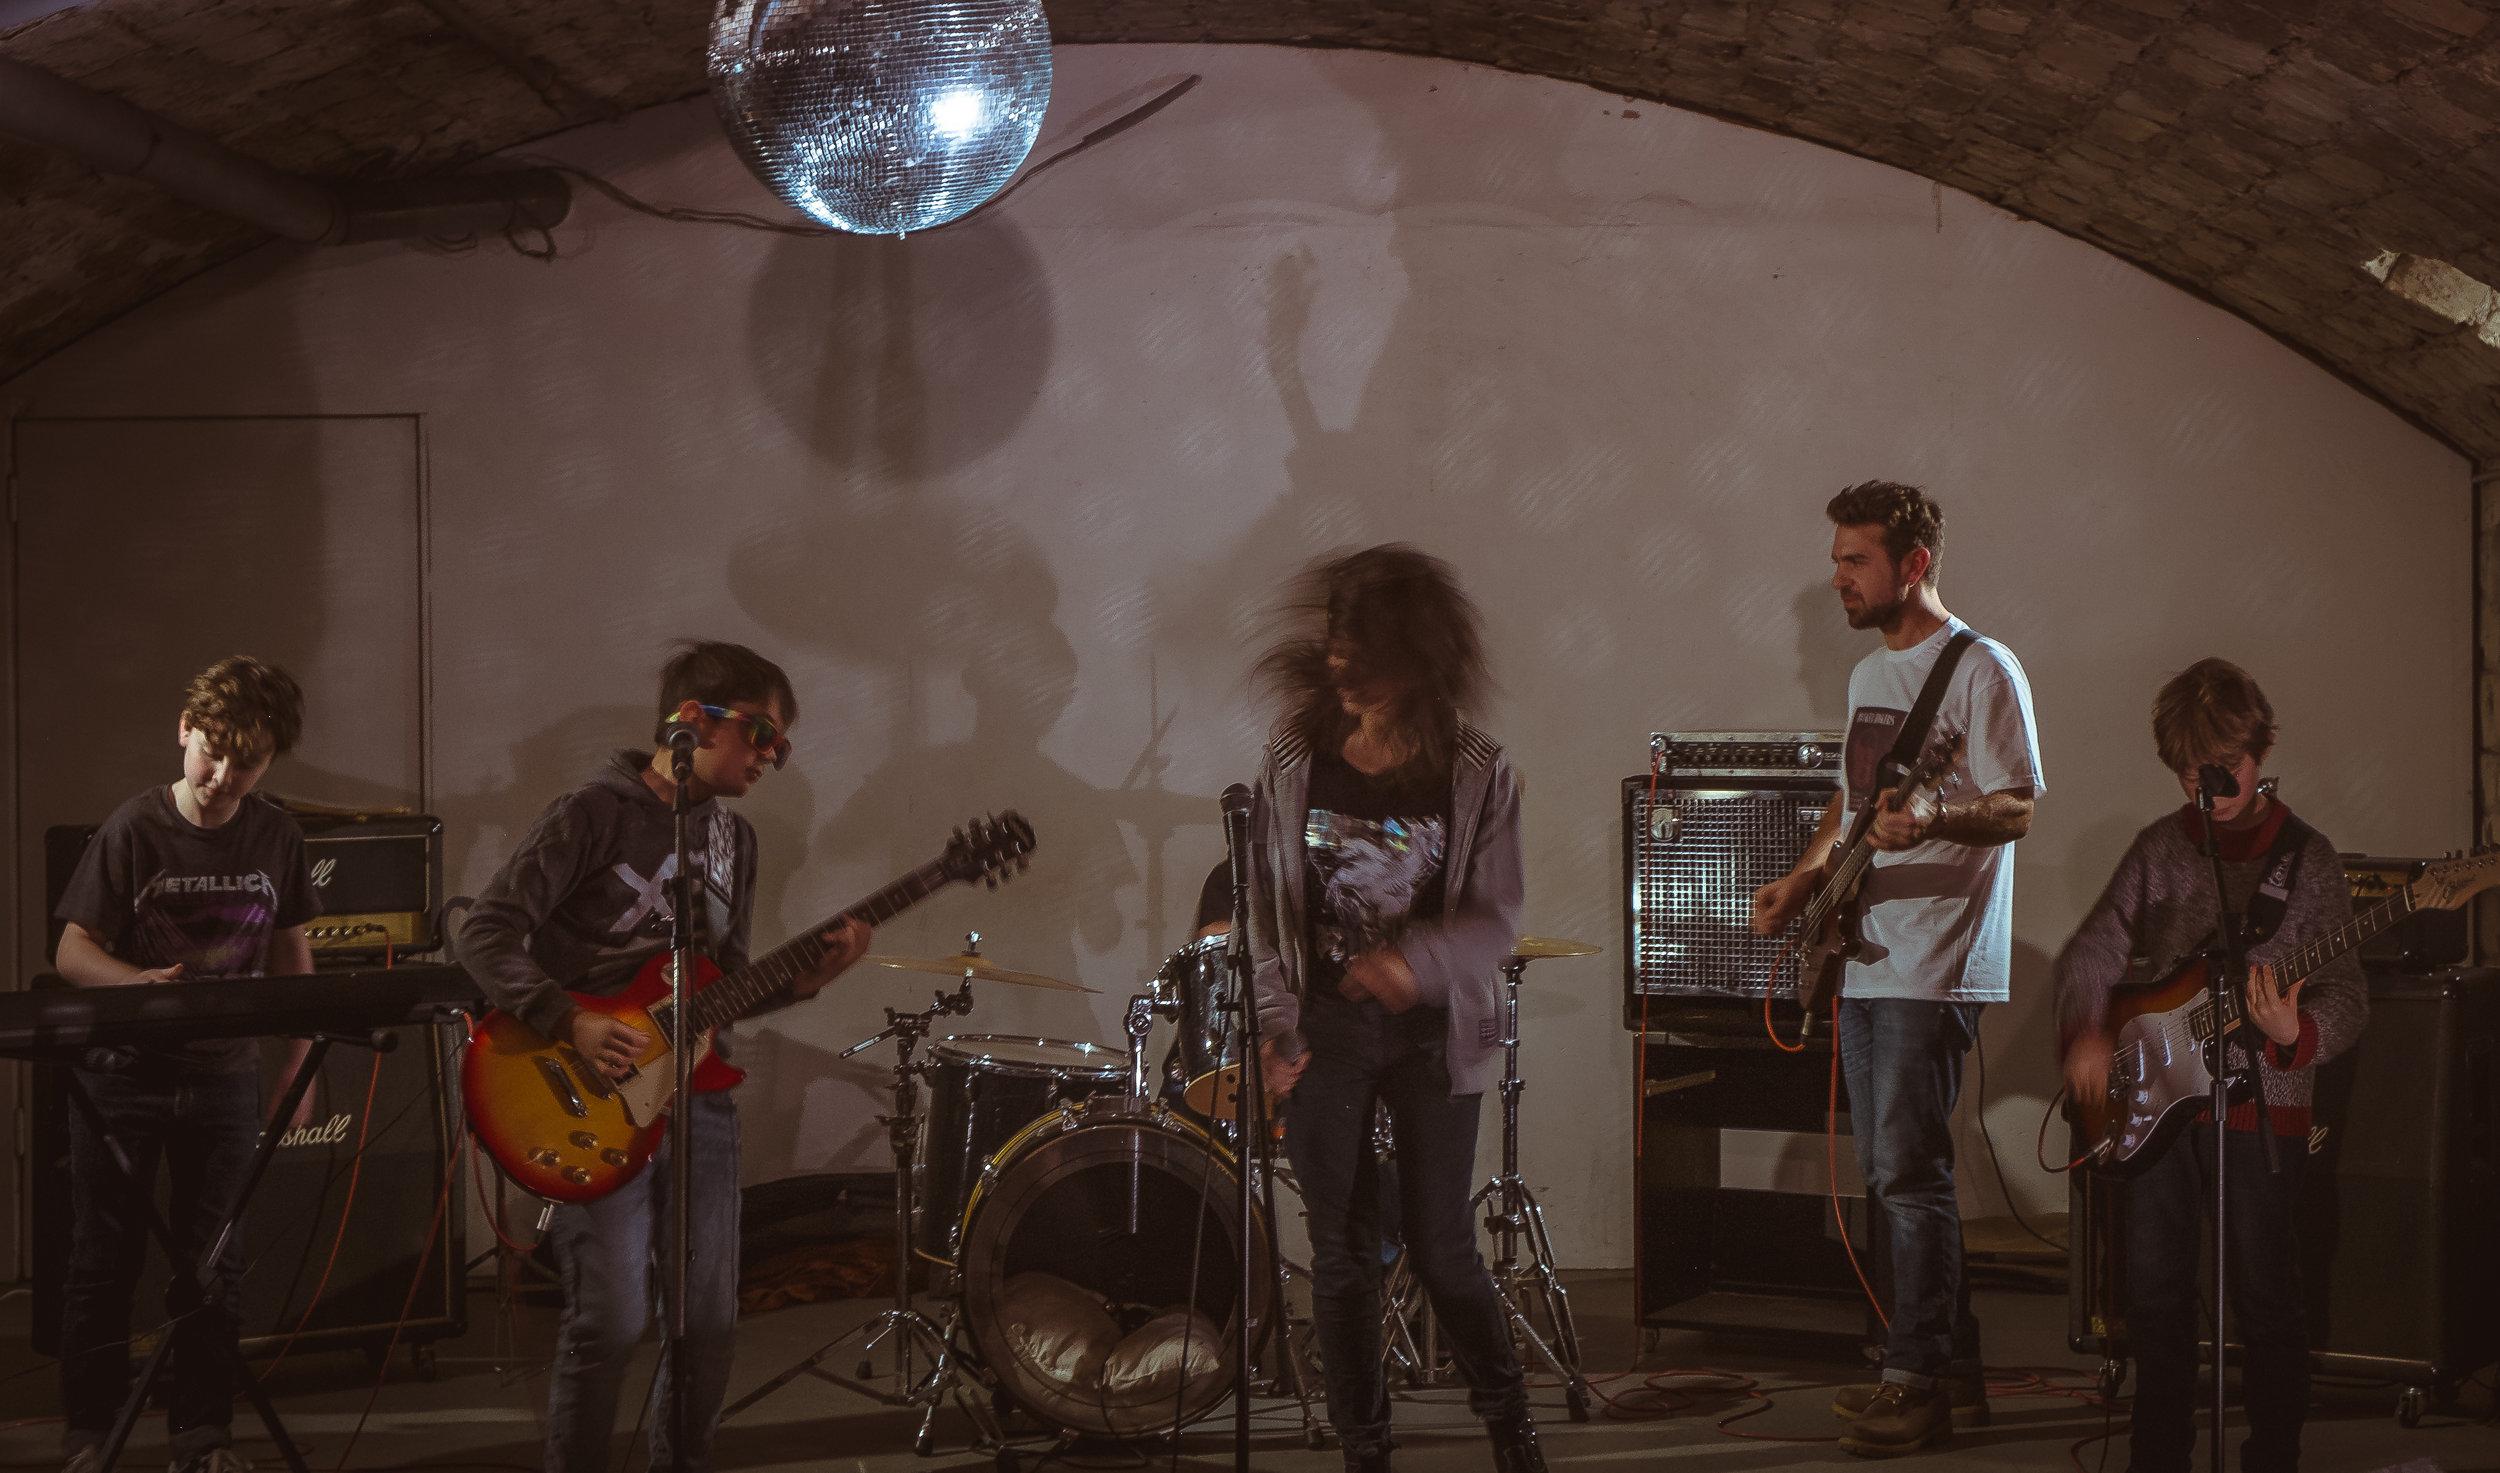 Paris Bandmates Beginner Program Performance